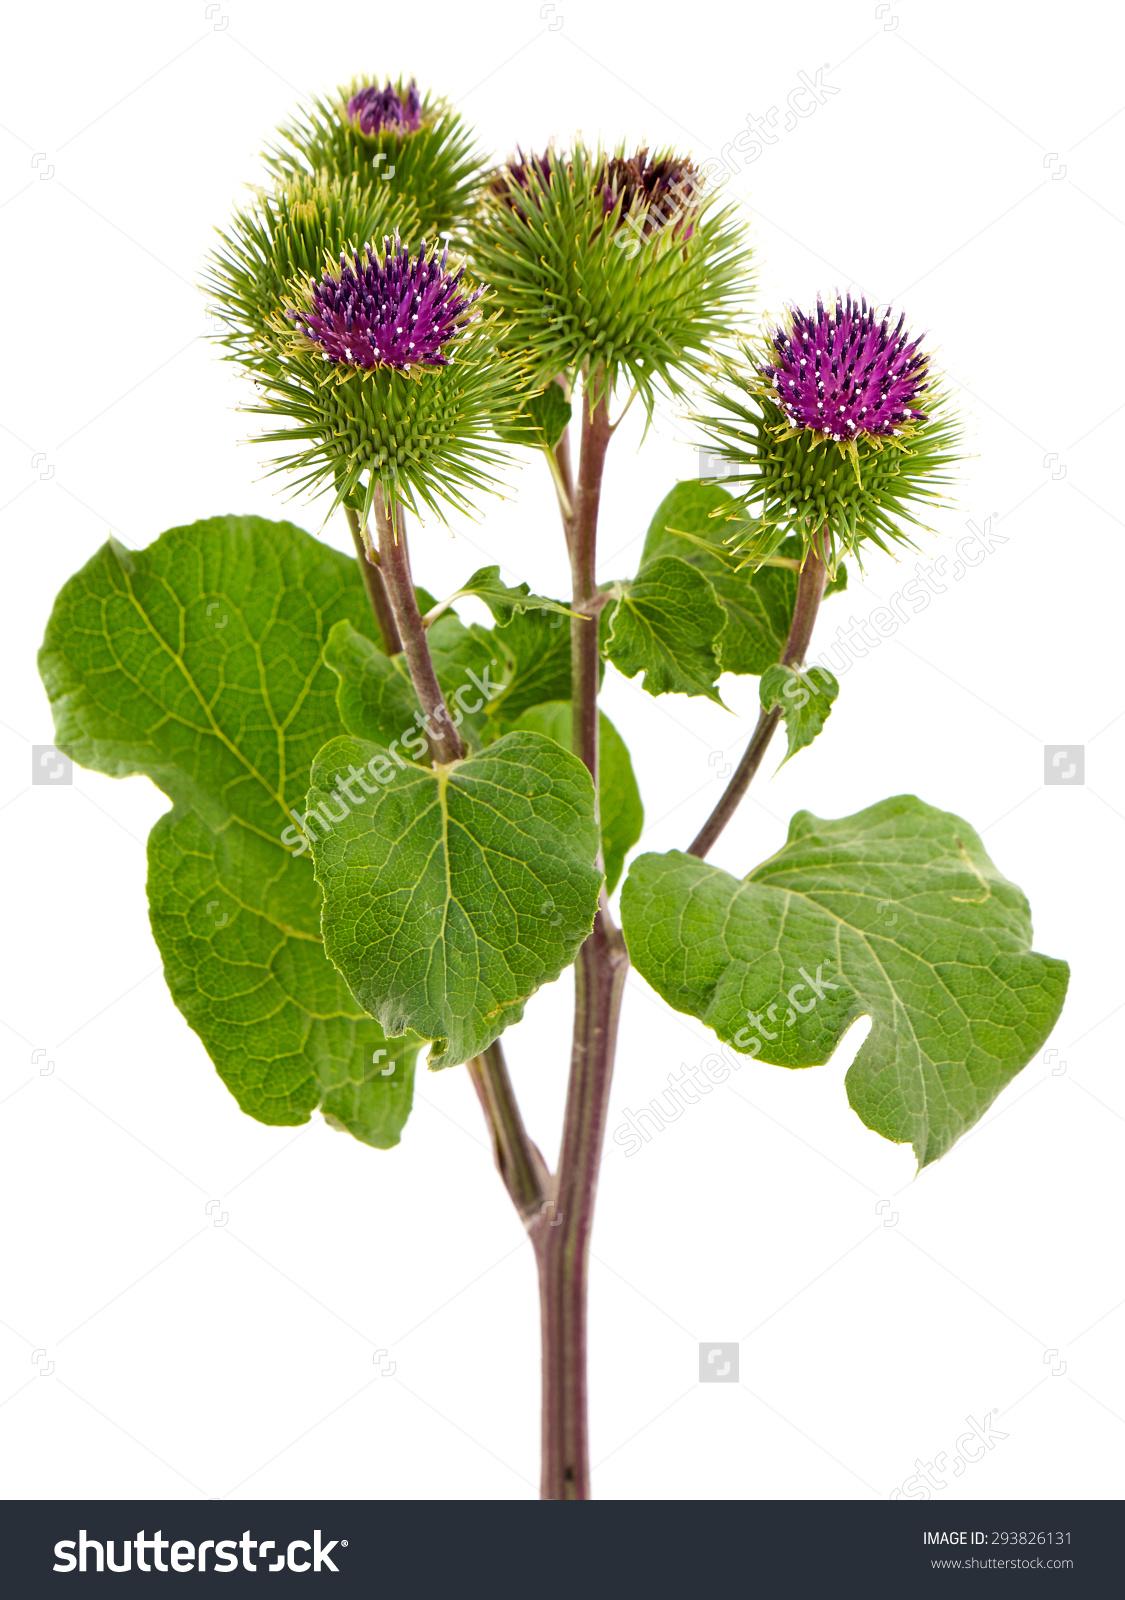 Burdock Plant Arctium Lappa Called Greater Stock Photo 293826131.